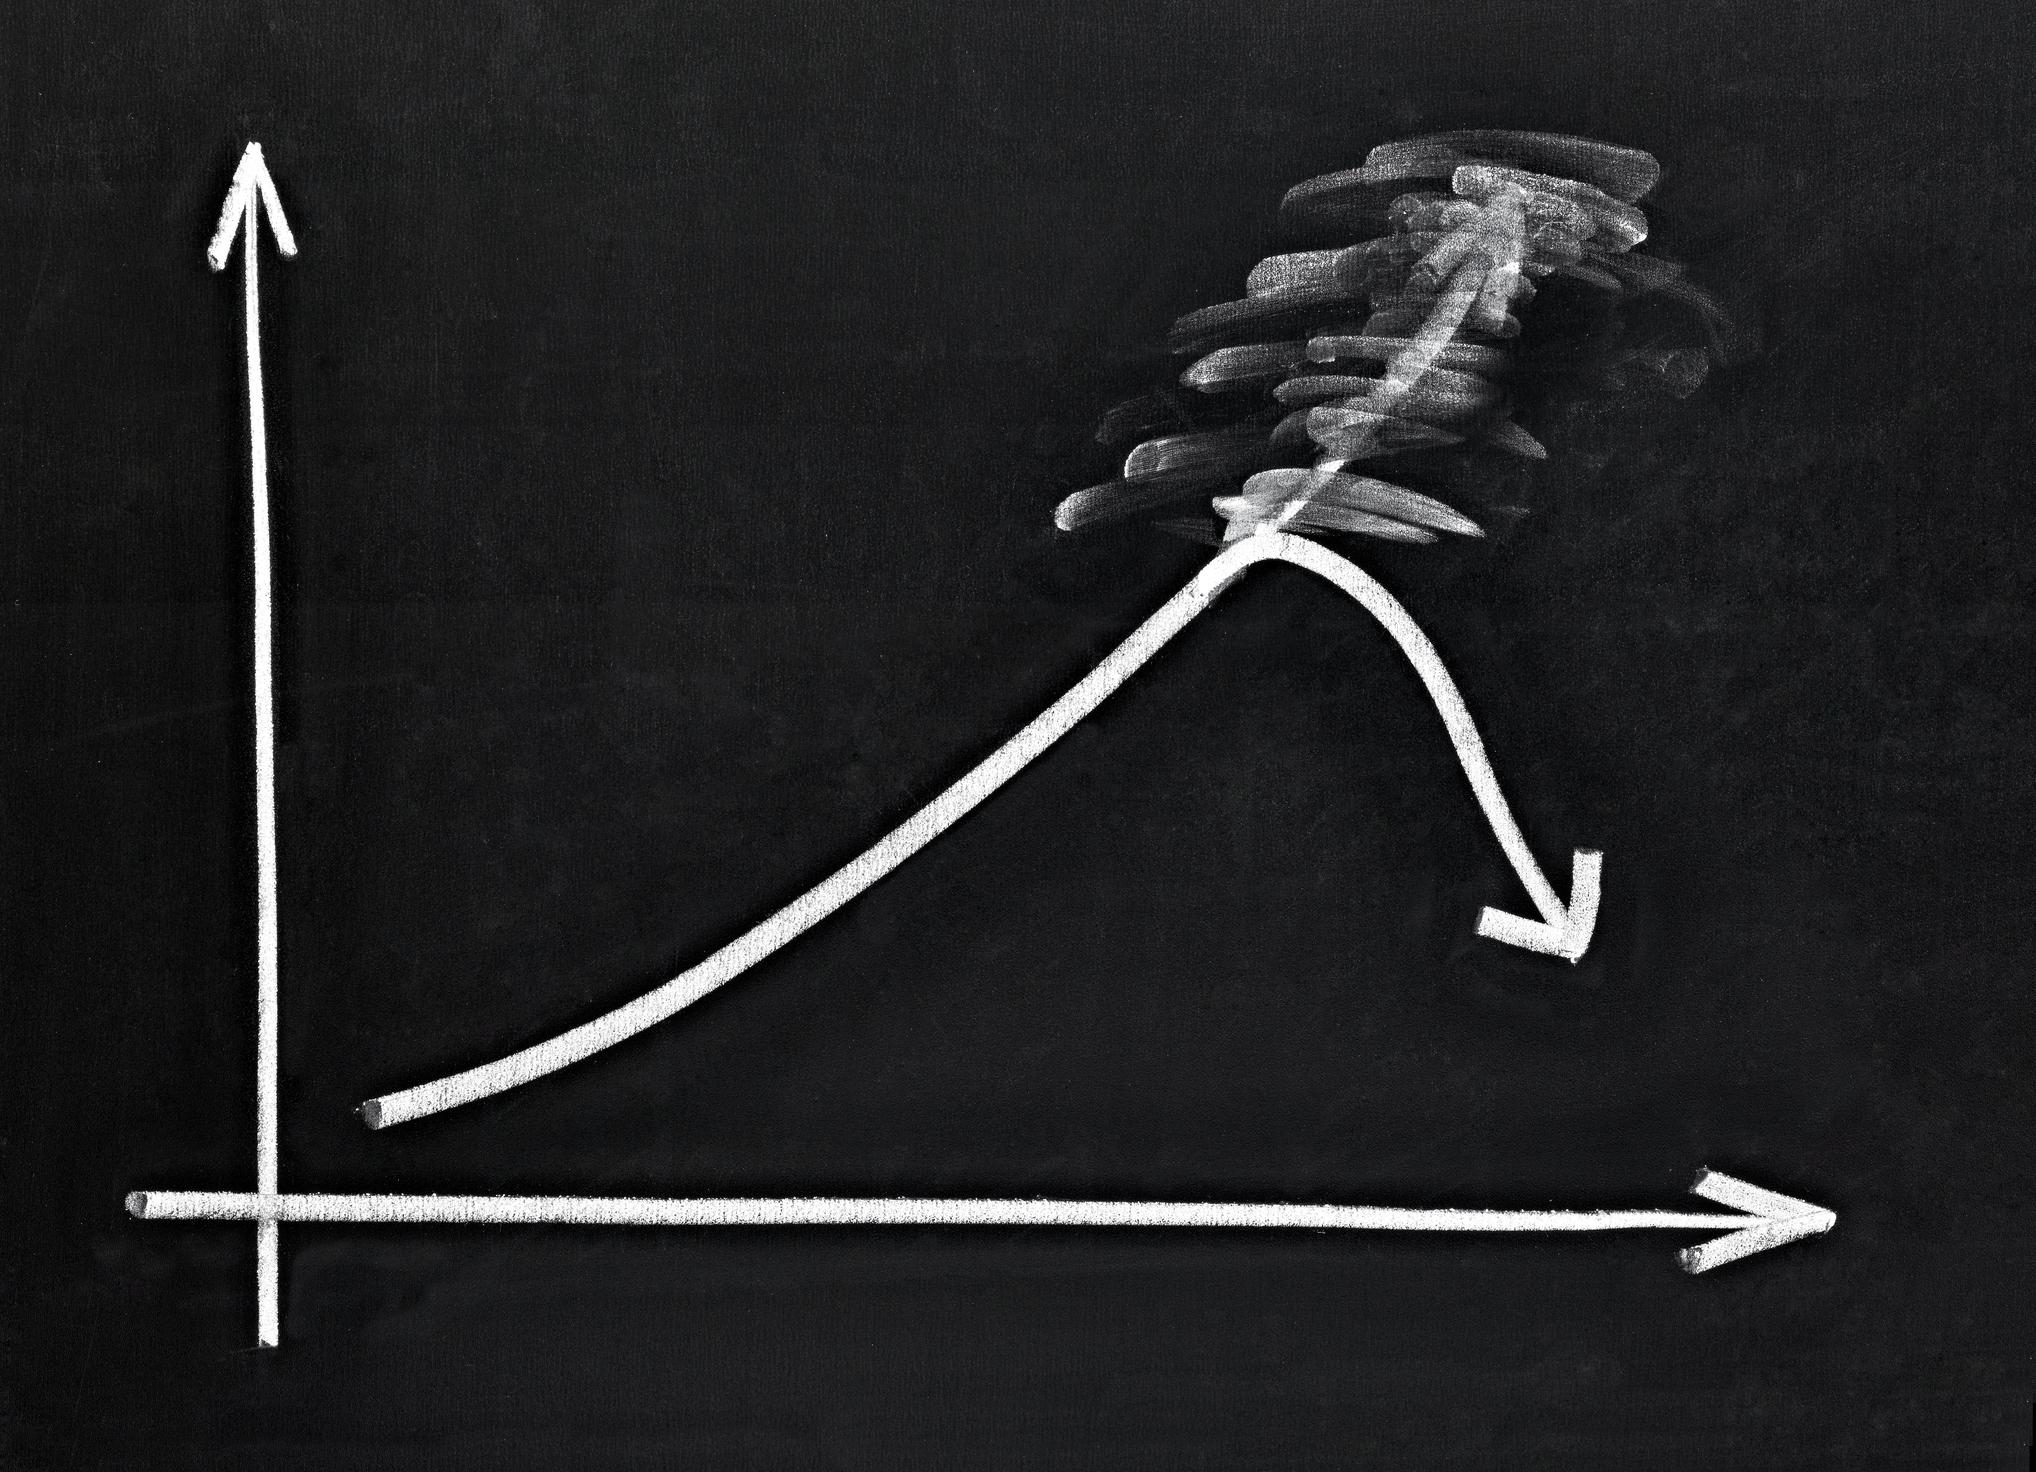 A positive chart turning negative drawn on a chalkboard.